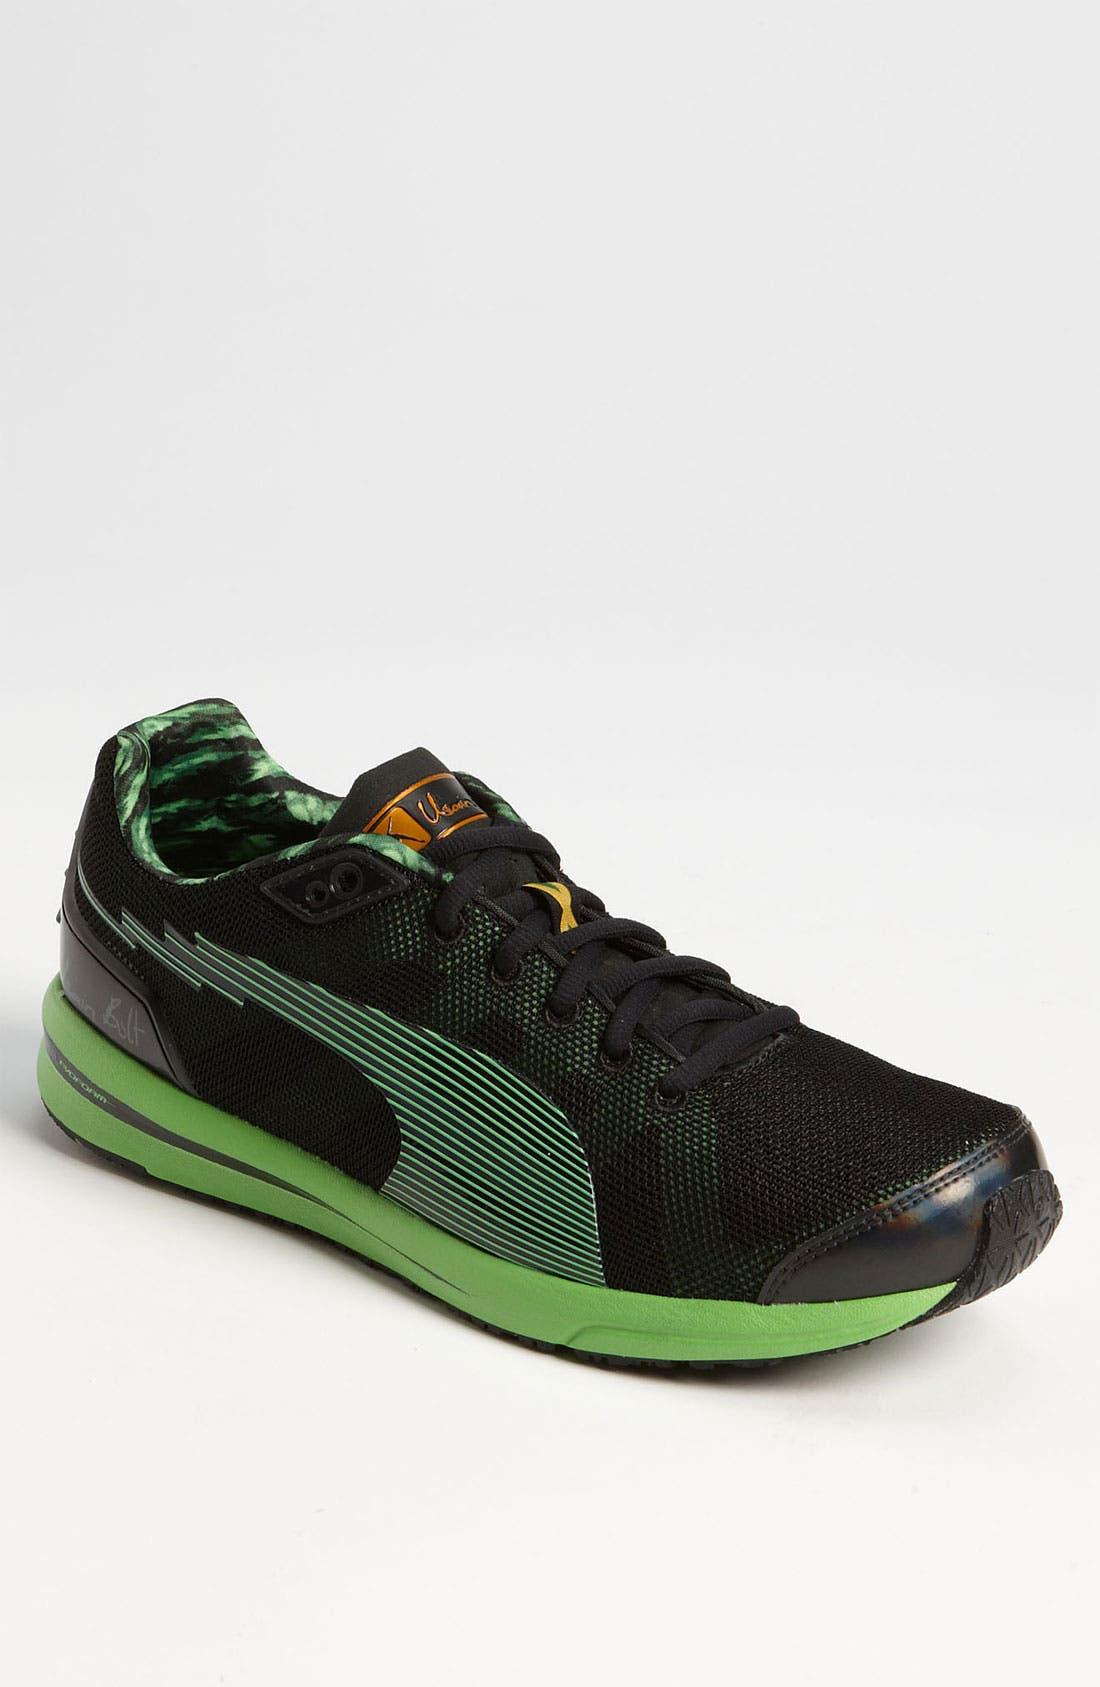 Alternate Image 1 Selected - PUMA 'Bolt evoSPEED' Running Shoe (Men)